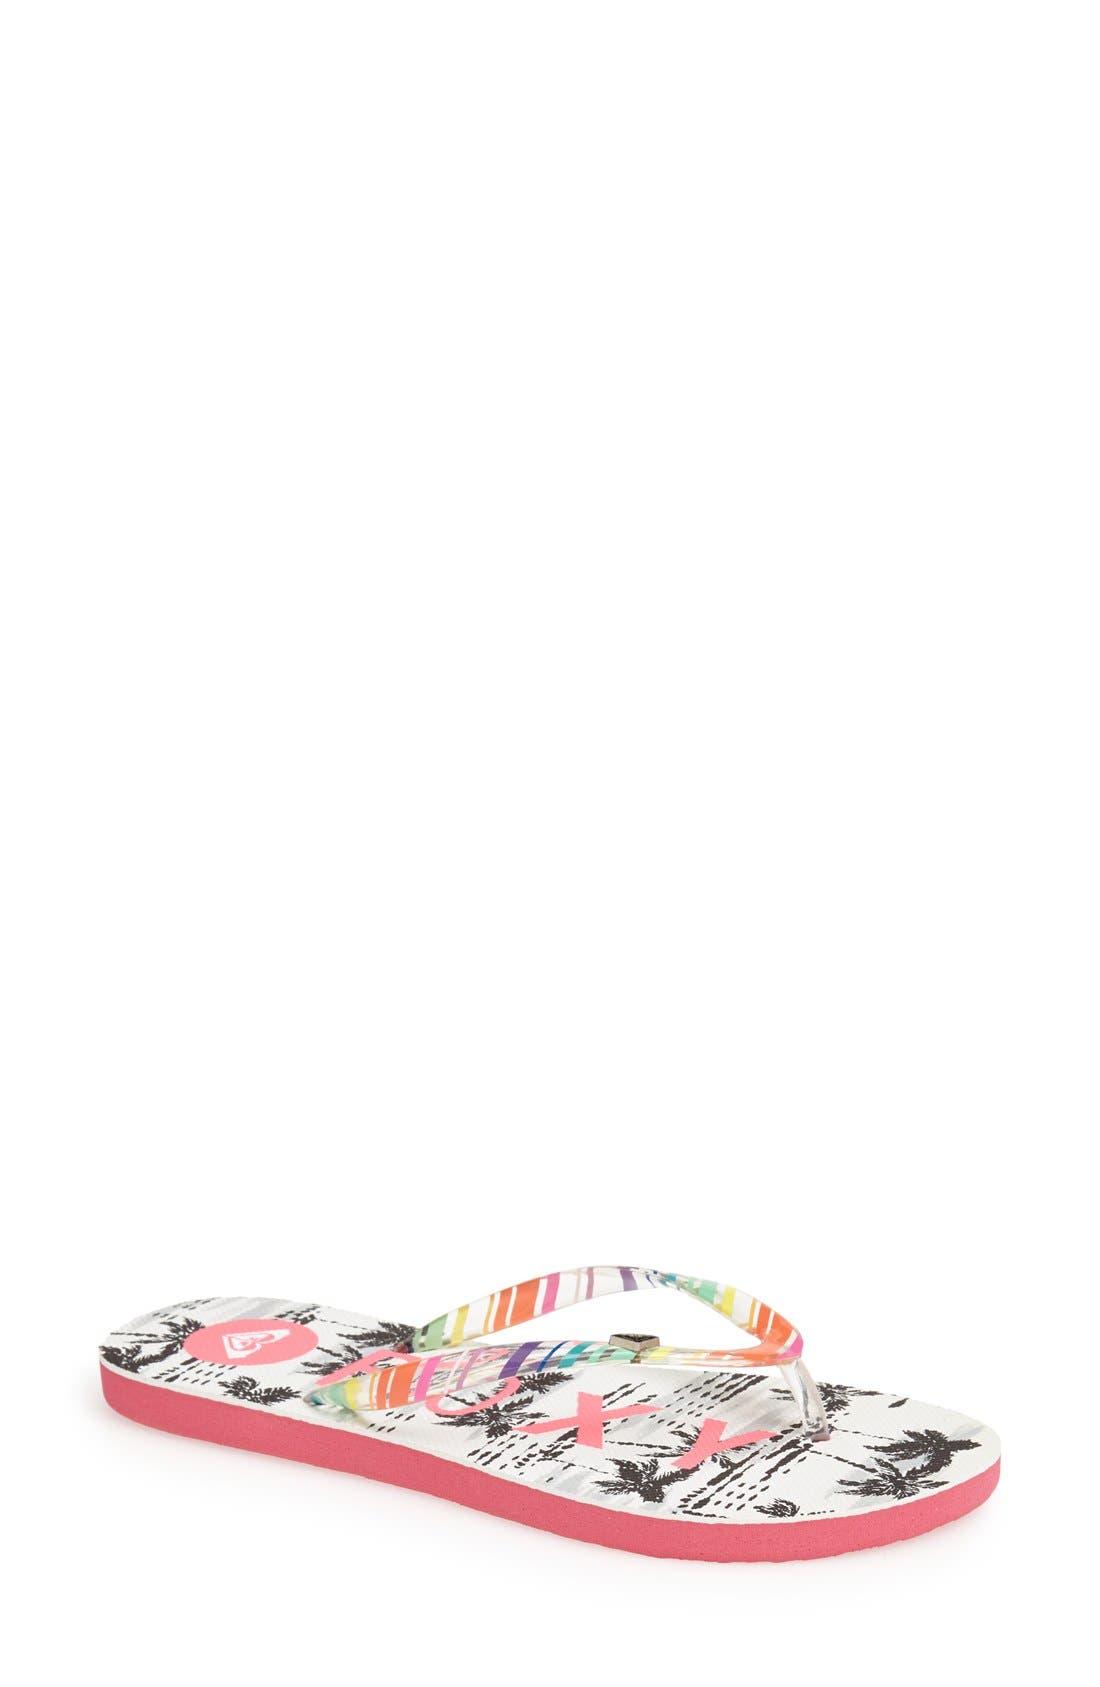 Main Image - Roxy 'Mimosa V' Sandal (Women)